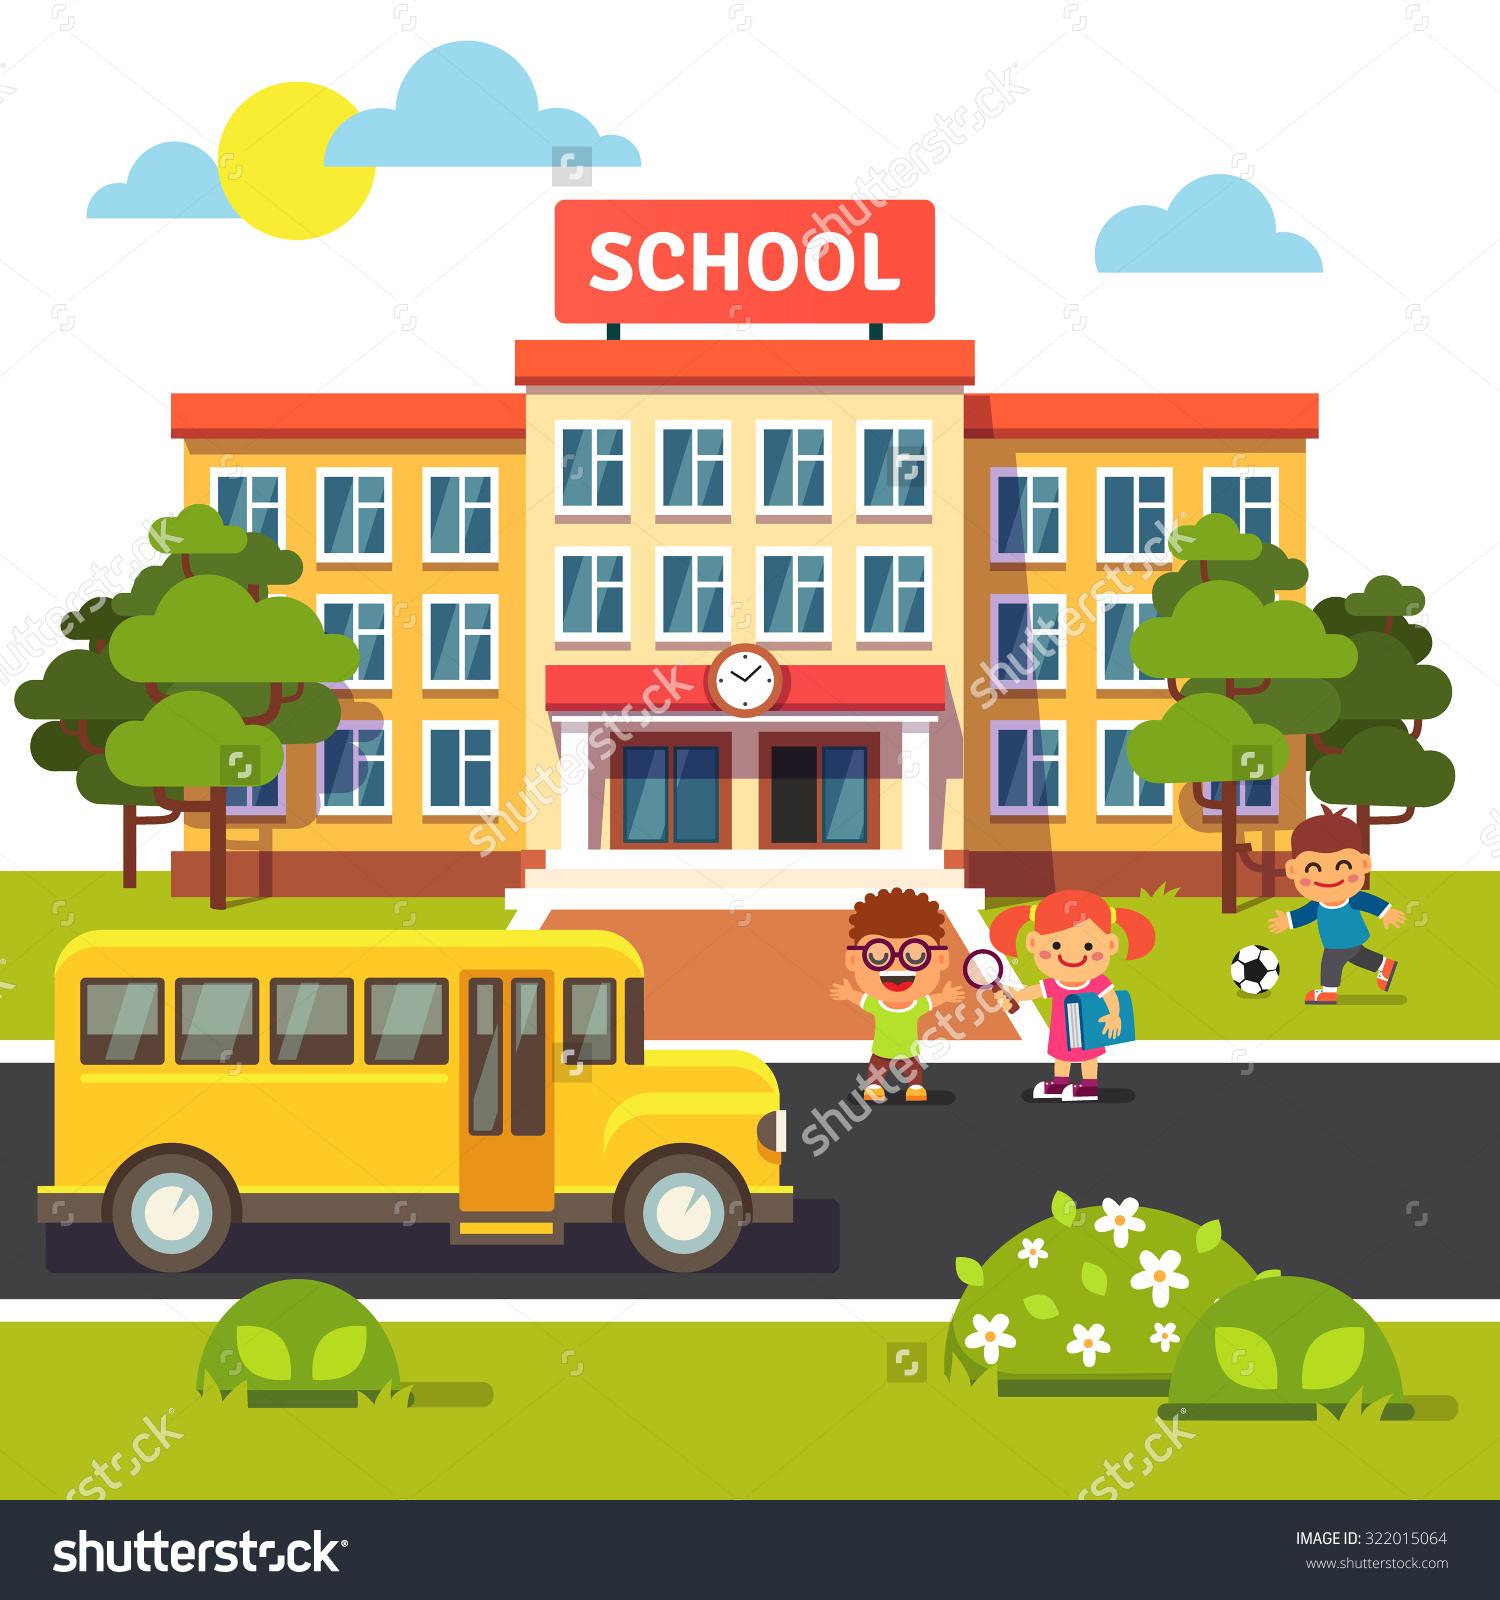 School building background clipart a normal school.